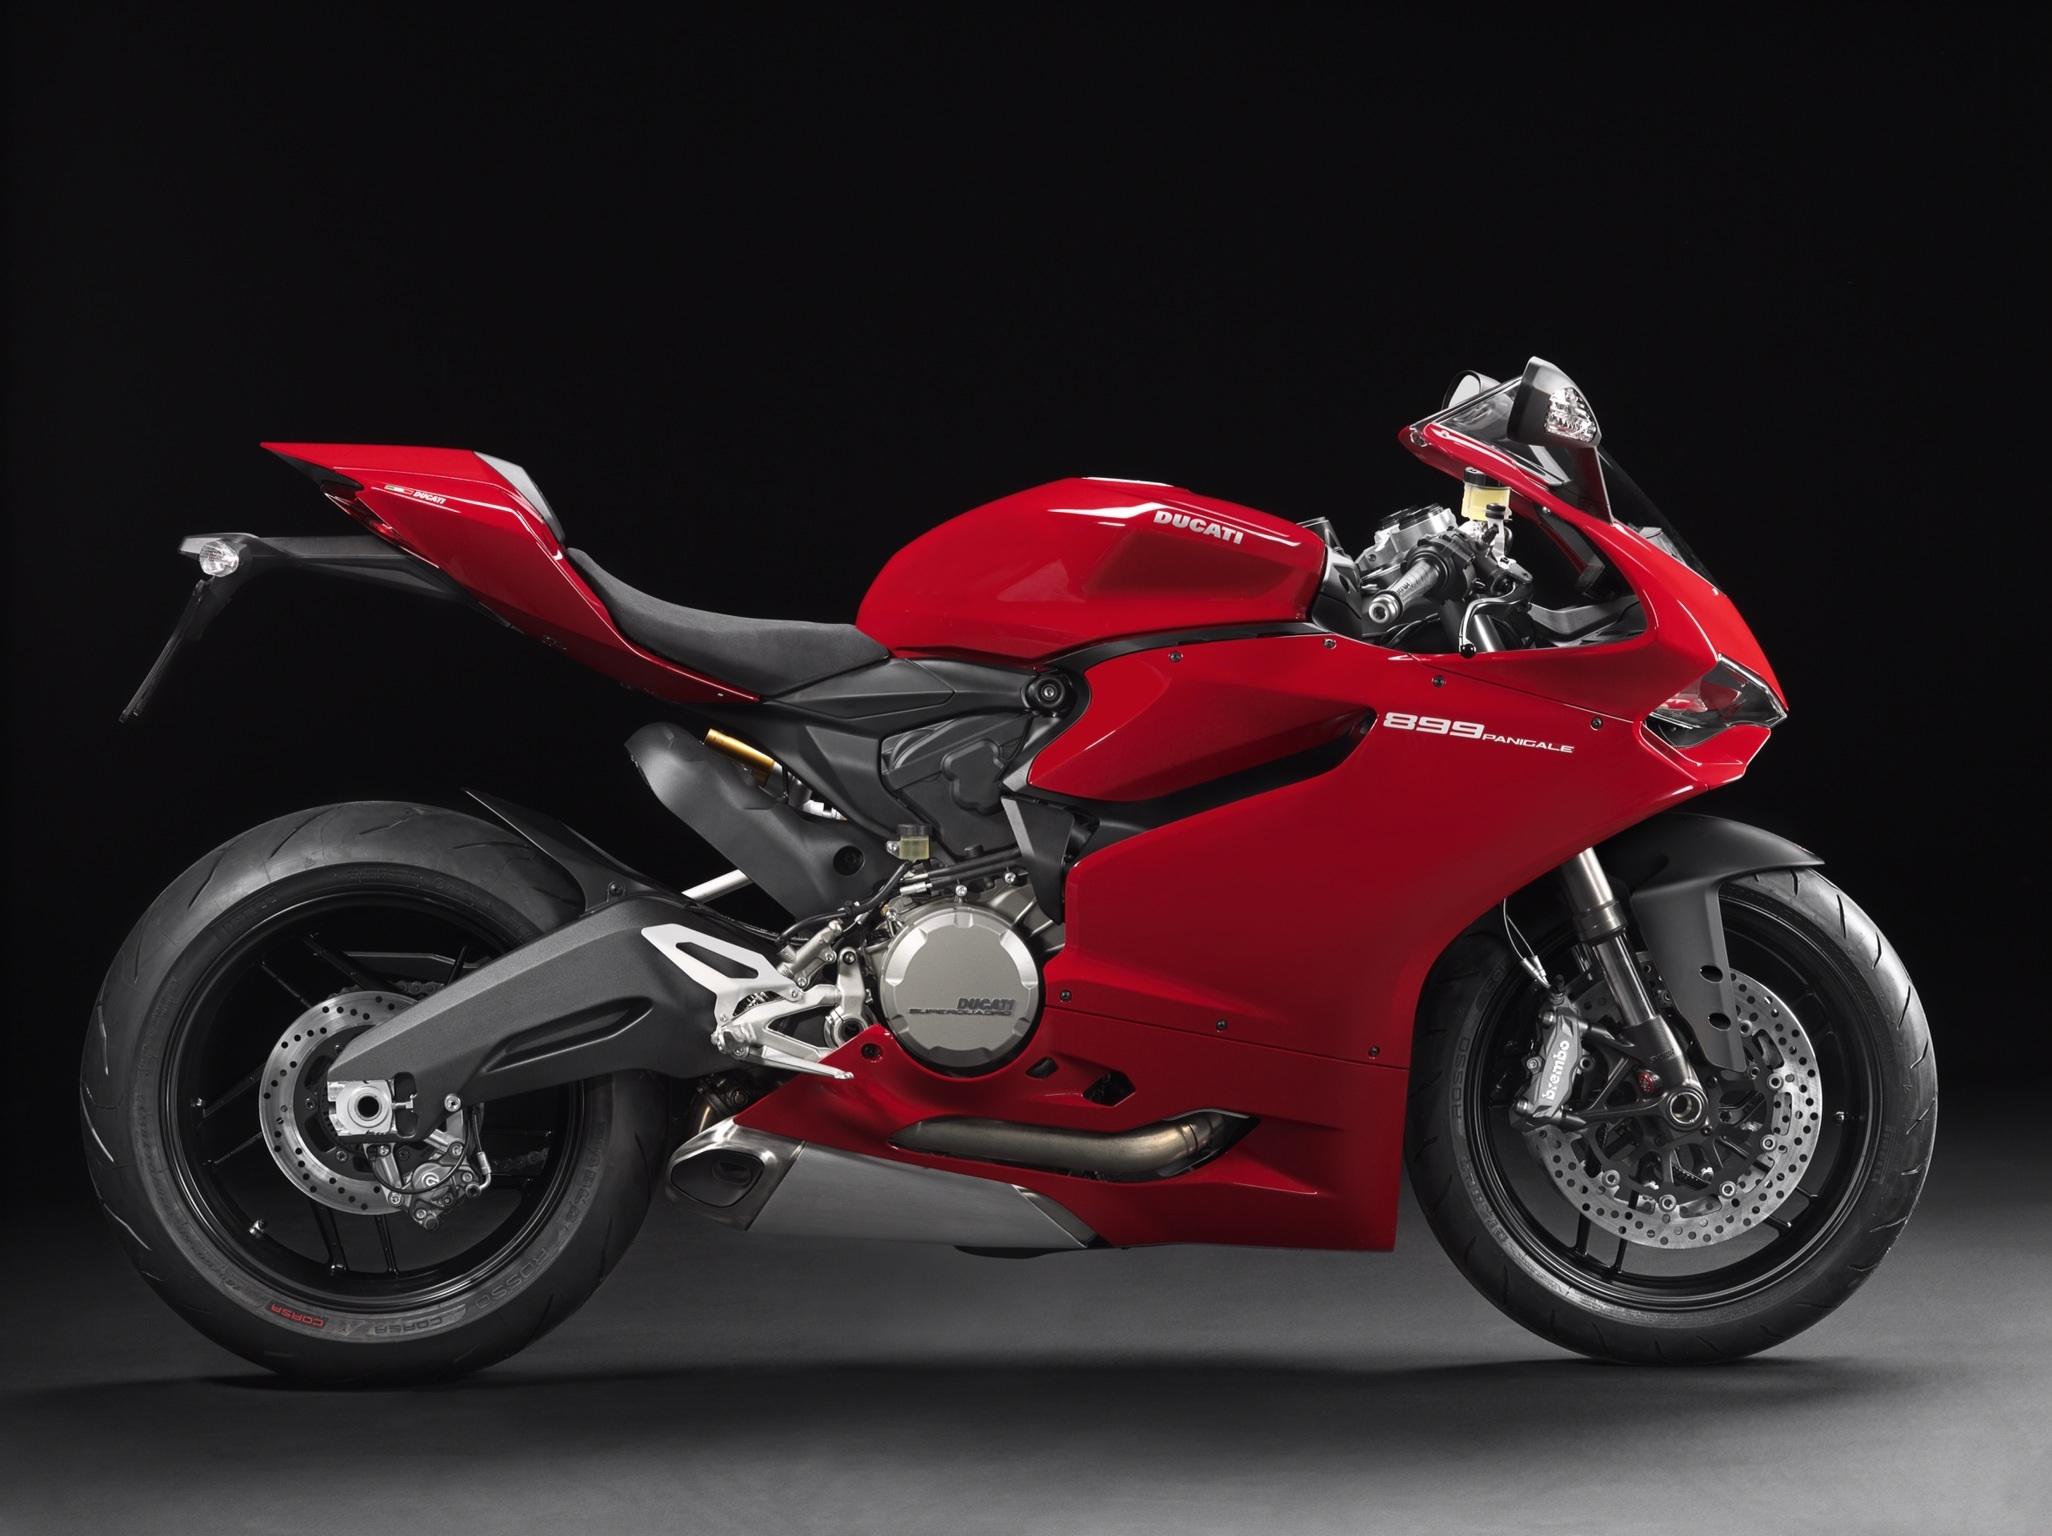 2014 Ducati 899 Panigale Breaks Cover - Asphalt & Rubber